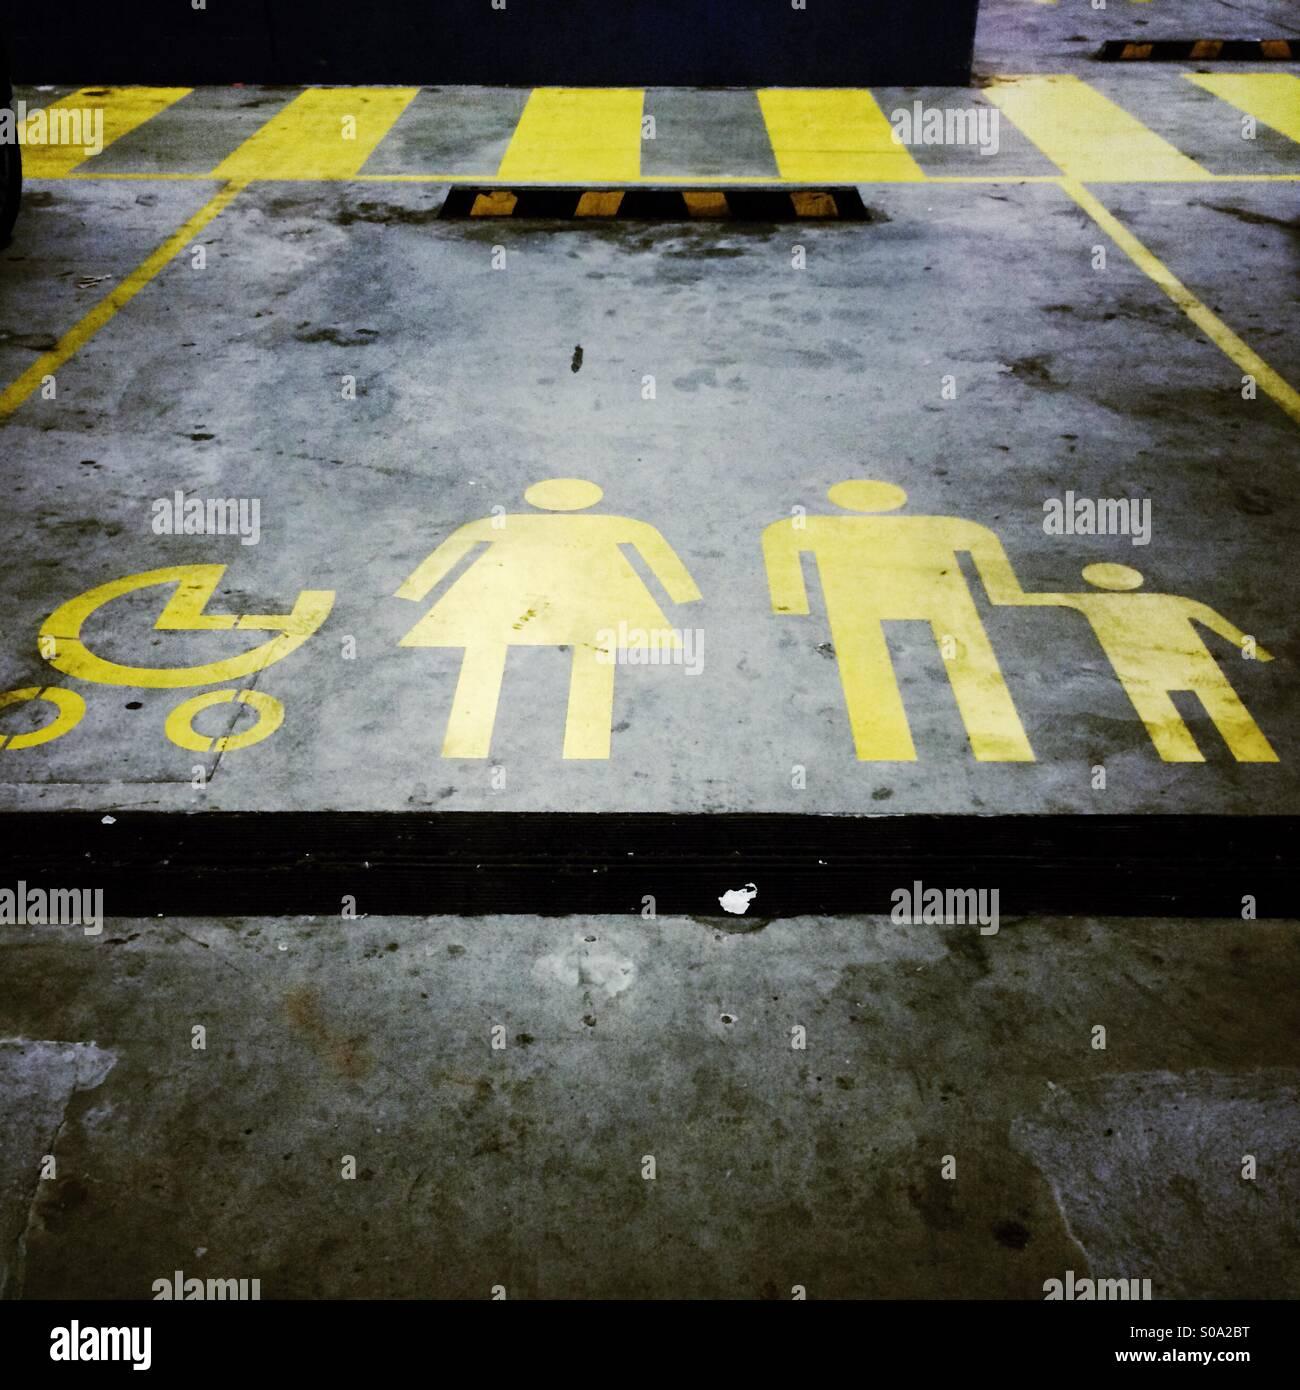 Plaza de aparcamiento reservada para familias con cochecitos Imagen De Stock